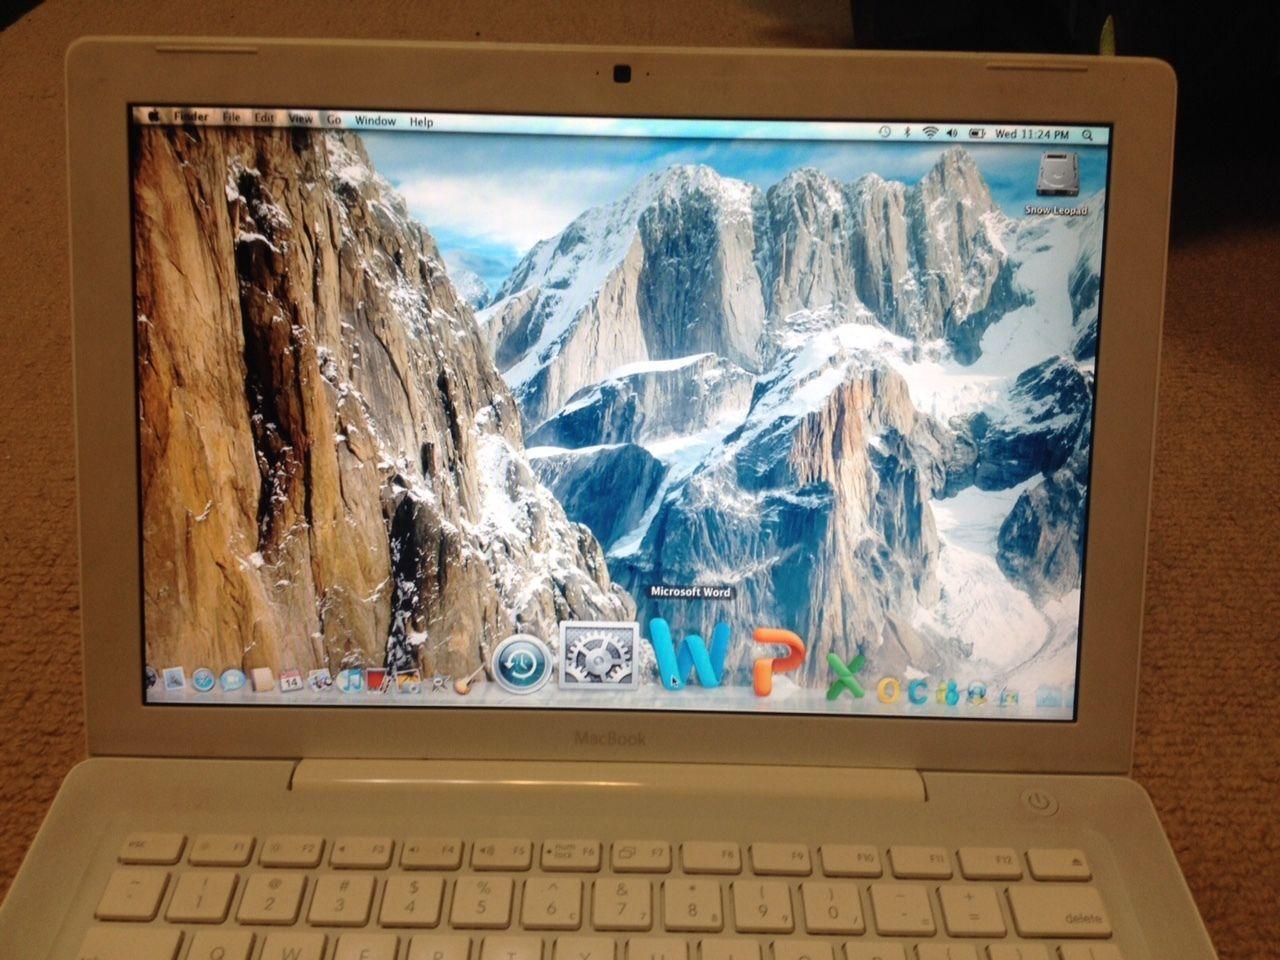 Le Macbook Intel Microsoft Office 2017 Pro Dualcore Mac X Webcam Laptop